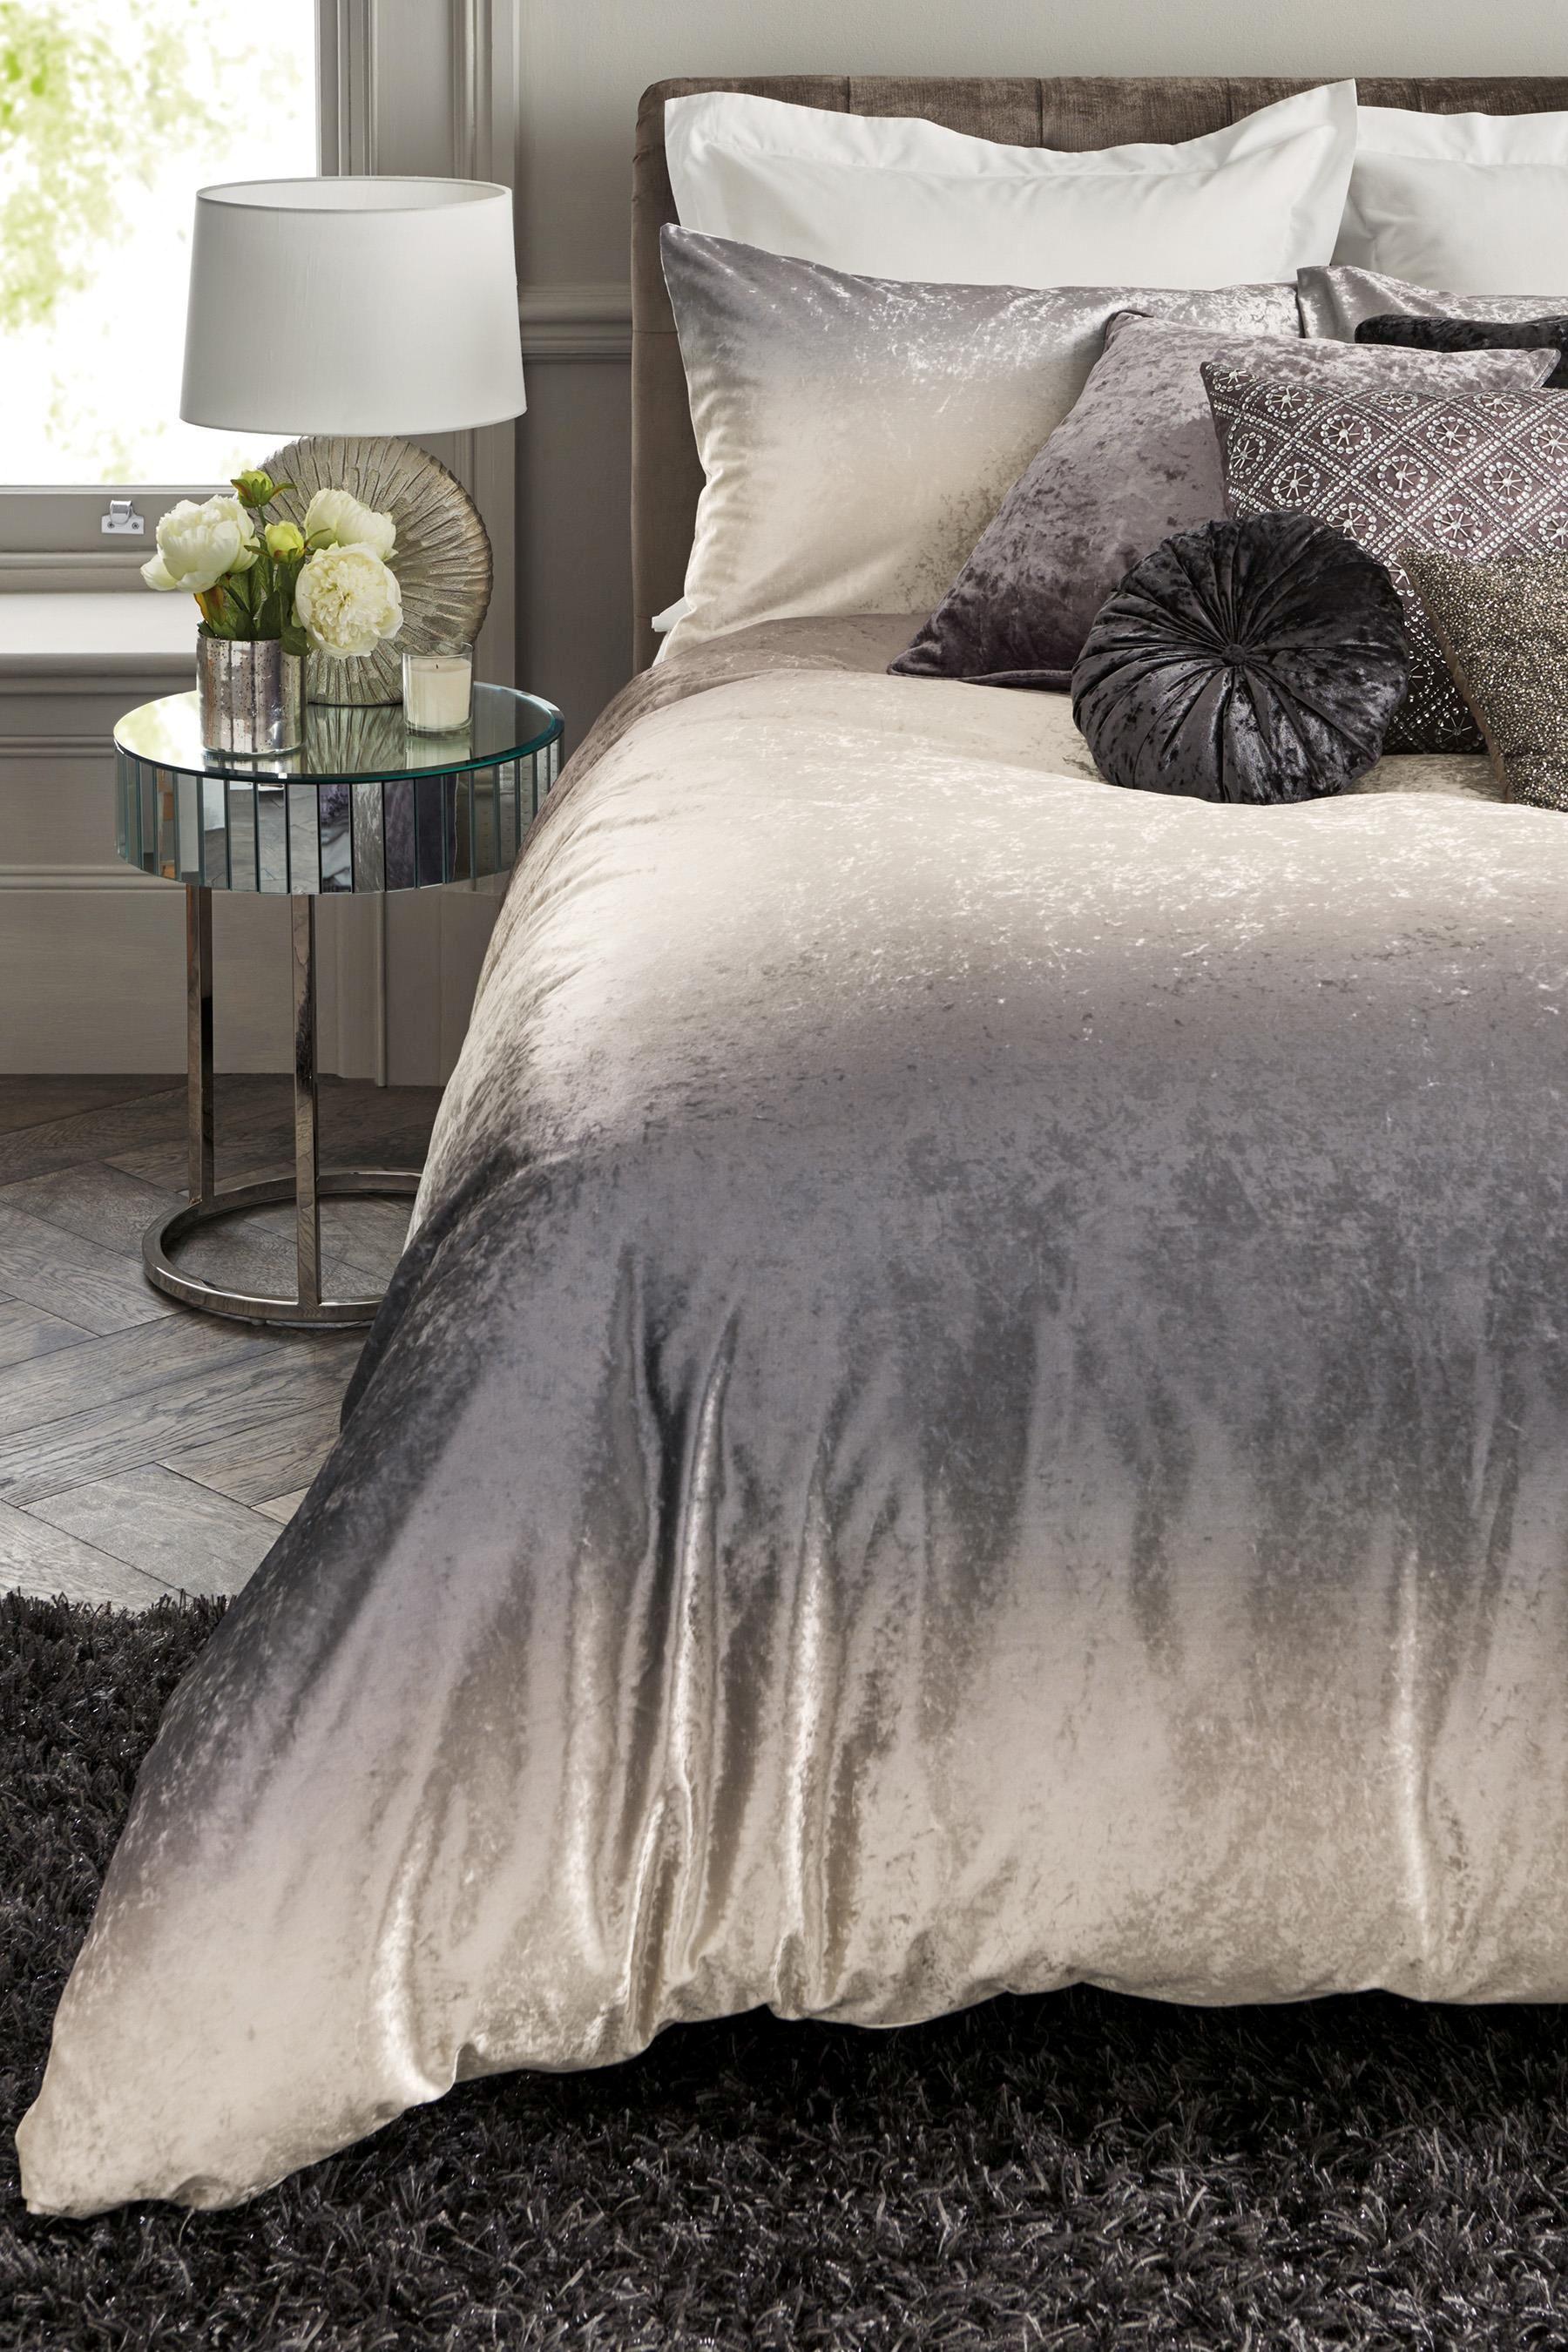 Ombre Velvet Bed Set From The Next Uk Online